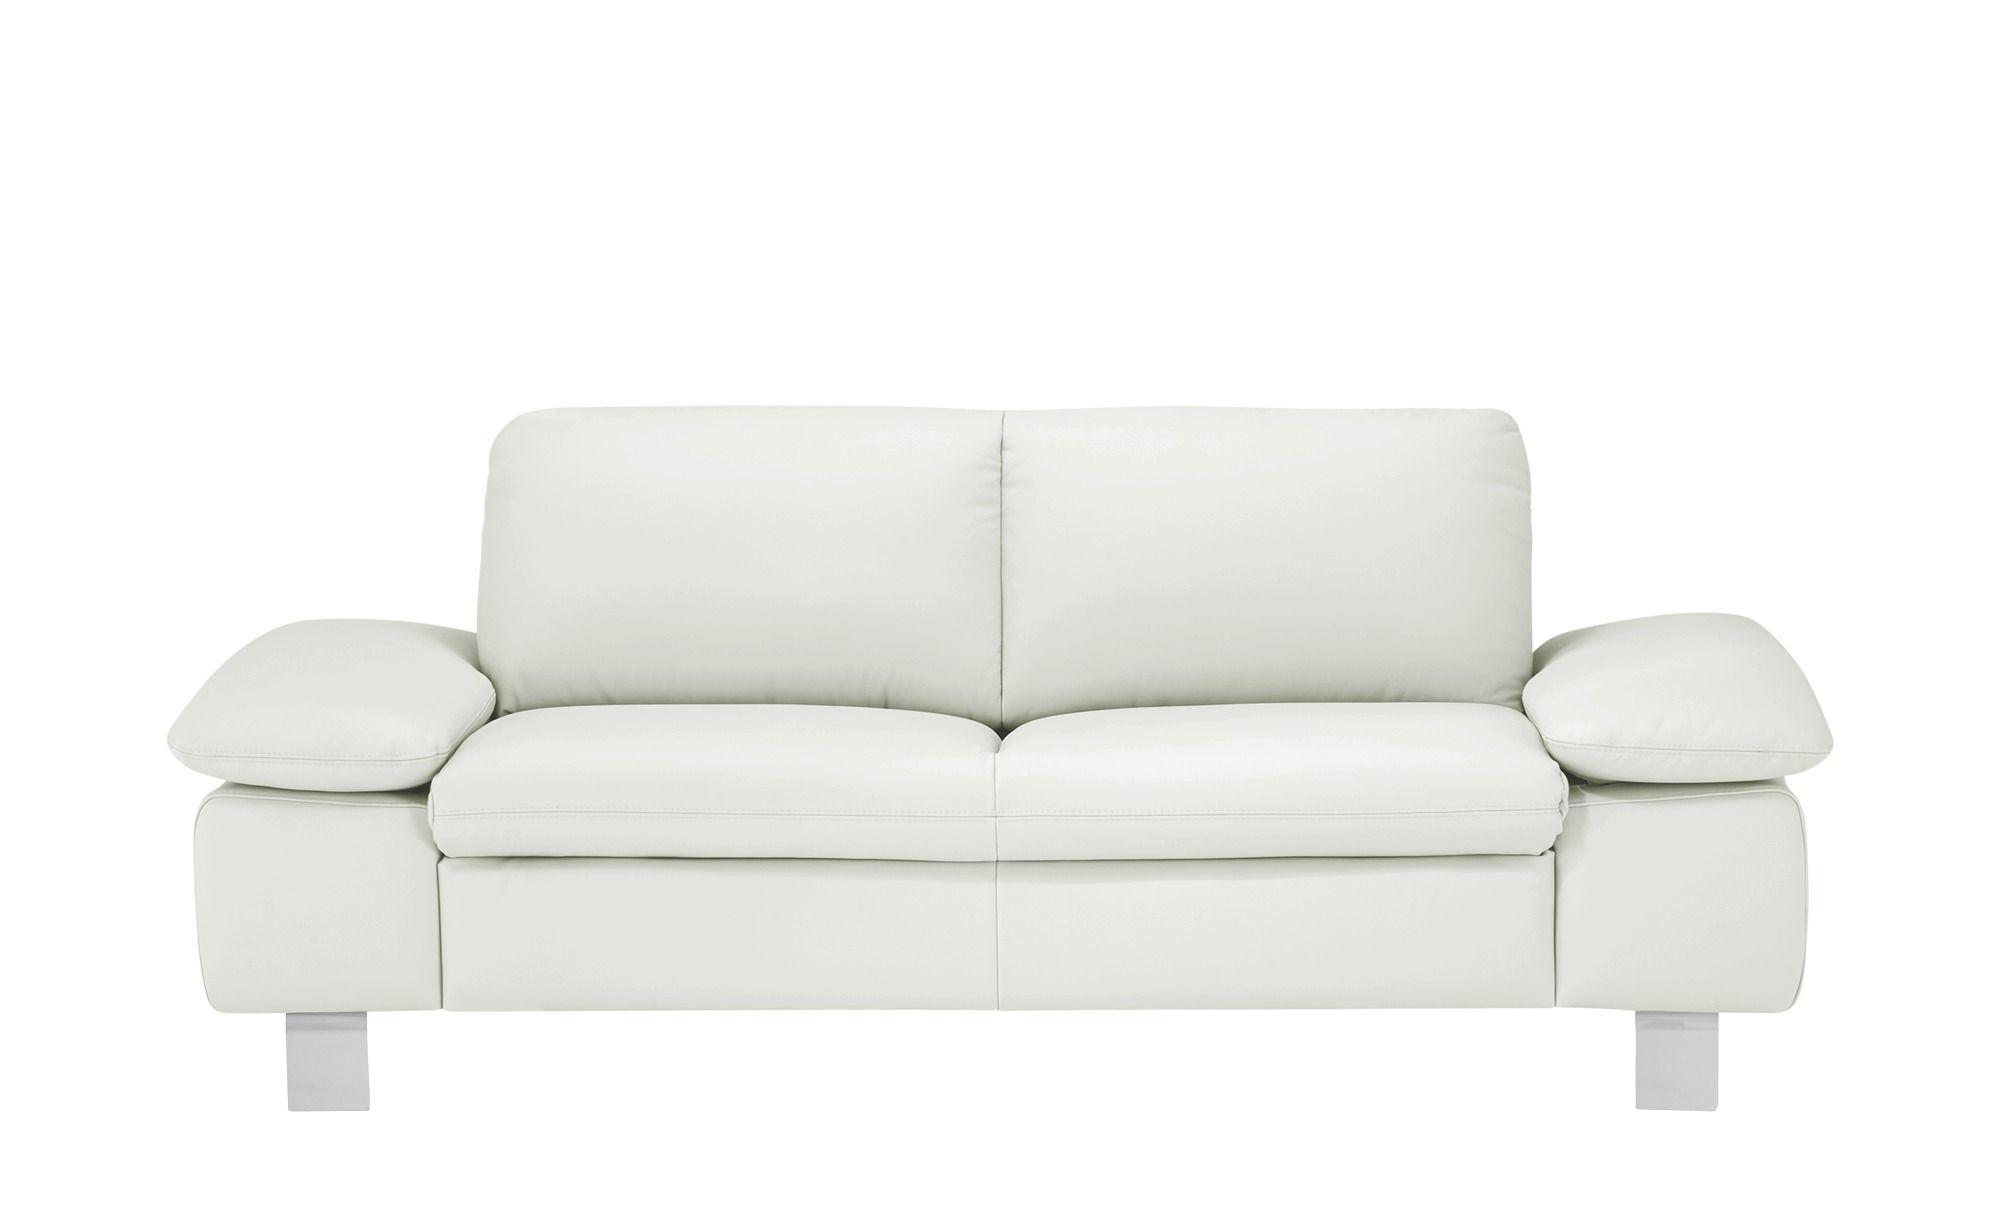 Smart Sofa Finola Gefunden Bei Mobel Hoffner Gunstige Sofas Sofa Hoffner